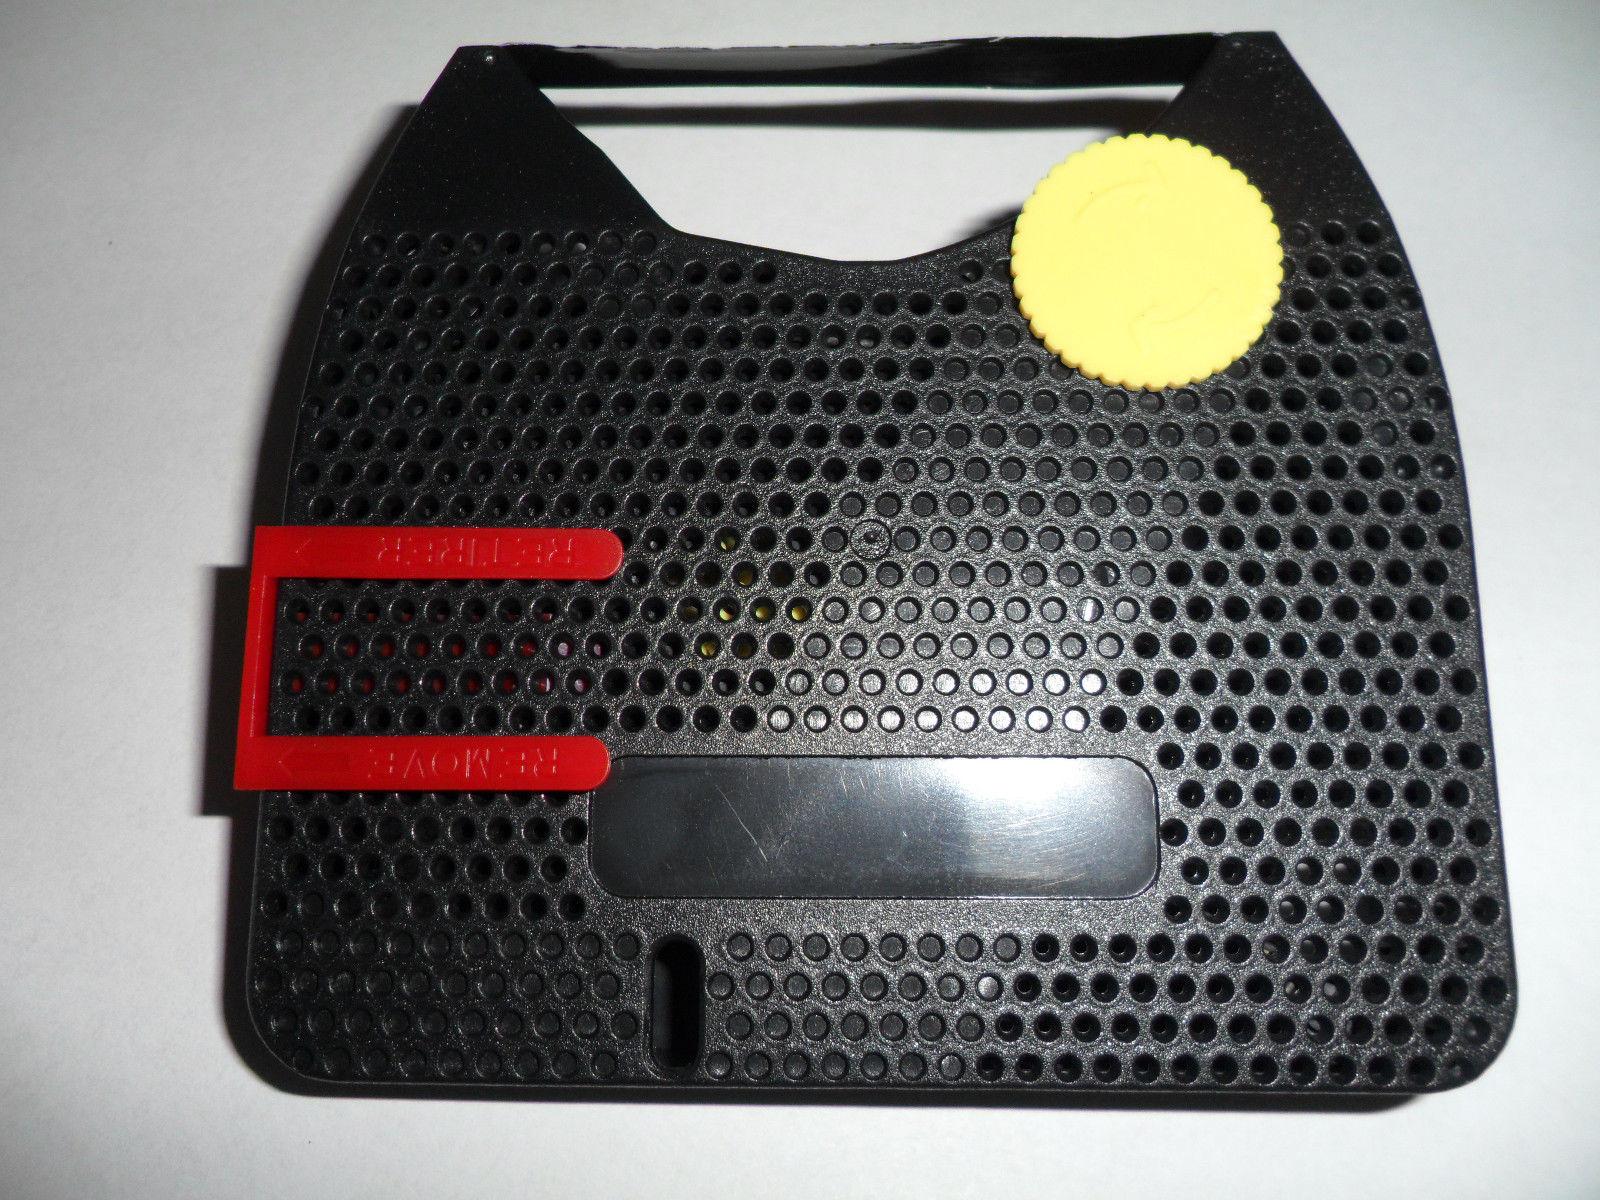 Smith Corona Mark XVIII Mark XX Typewriter Ribbon (2 Pack) Replaces 21000